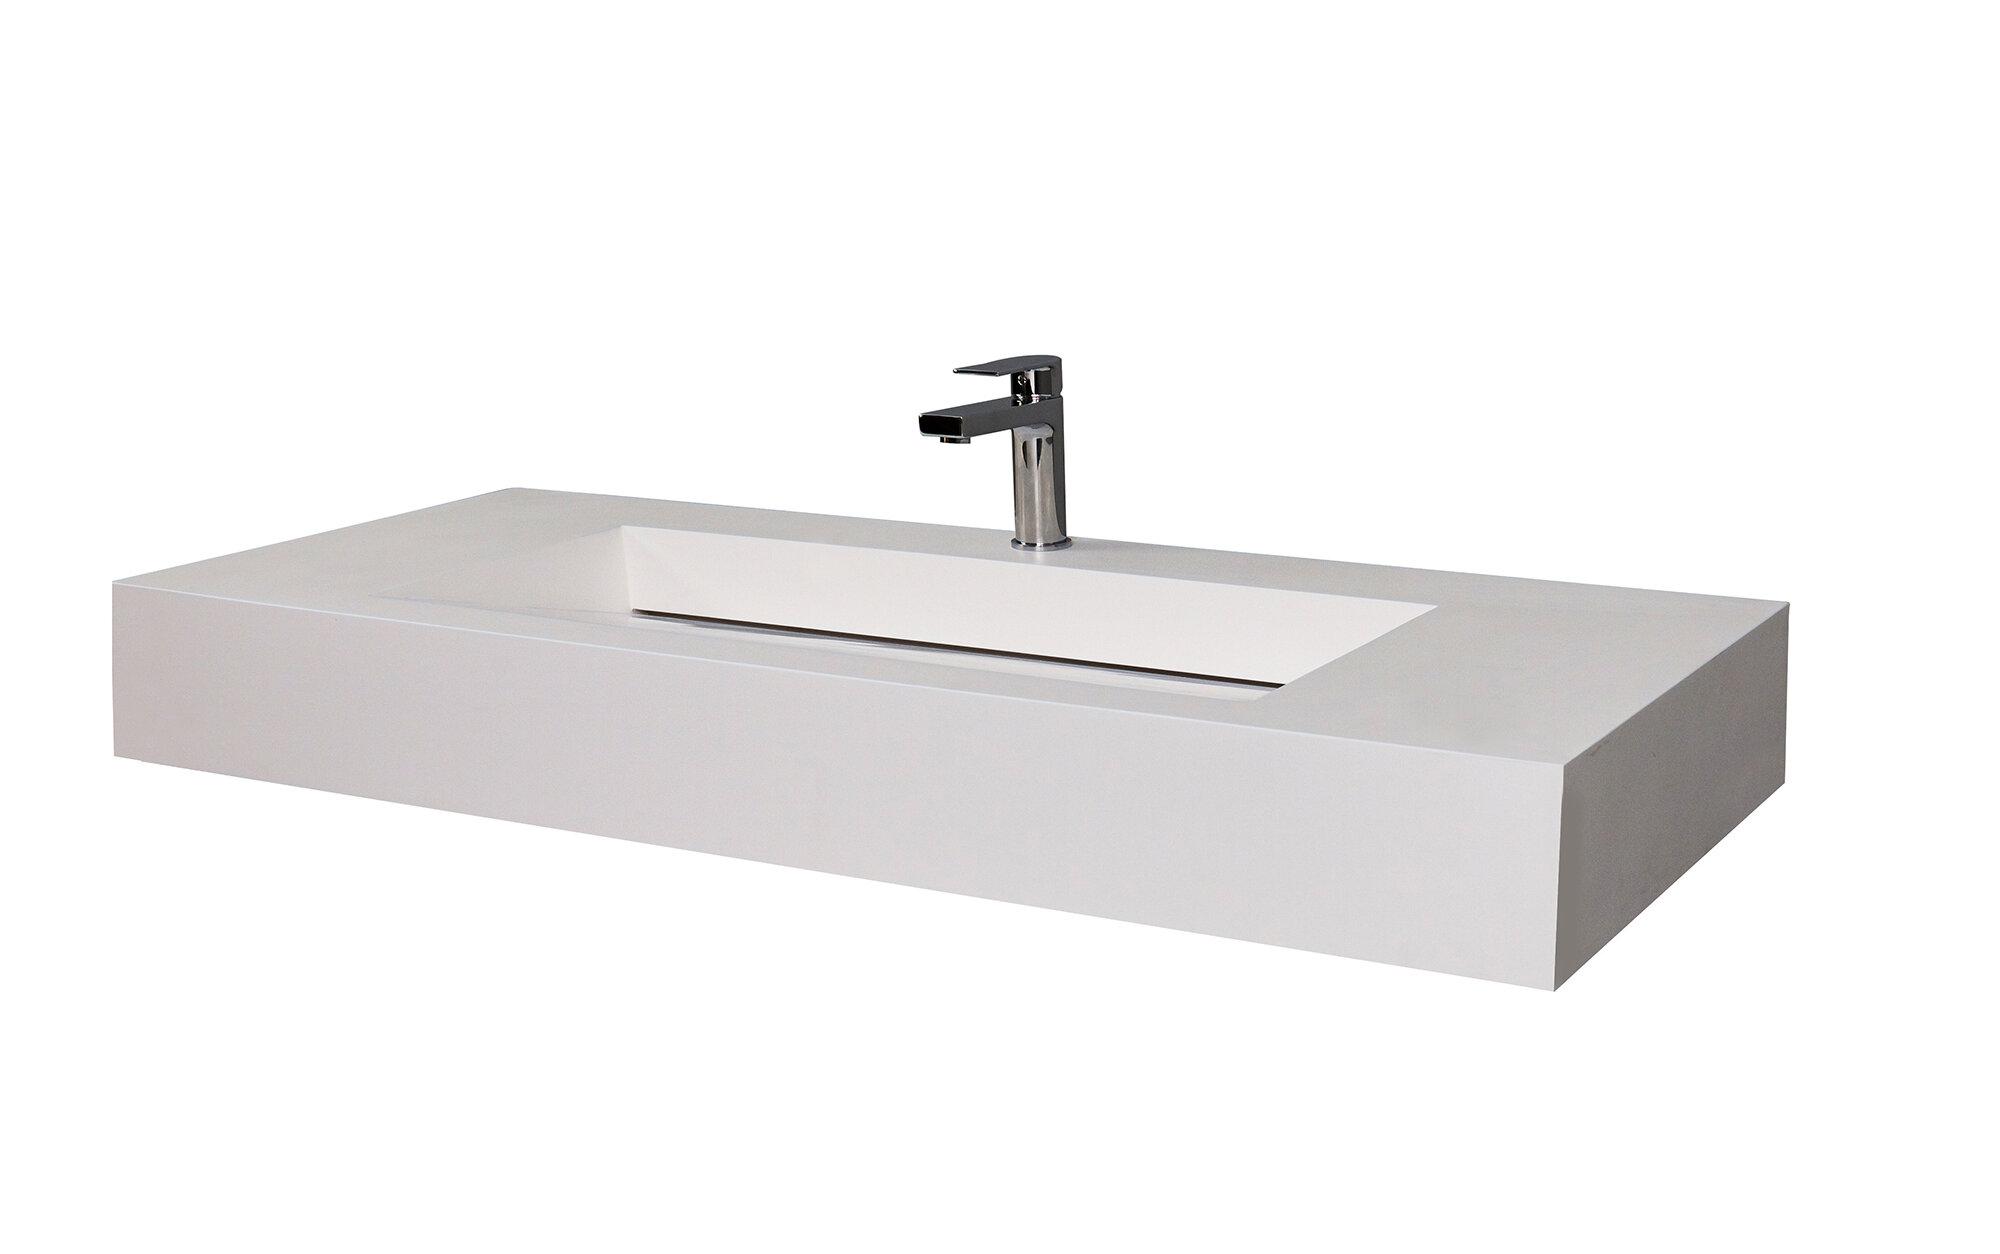 Castellousa Audrey 48 Single Bathroom Vanity Top With Sink Reviews Wayfair